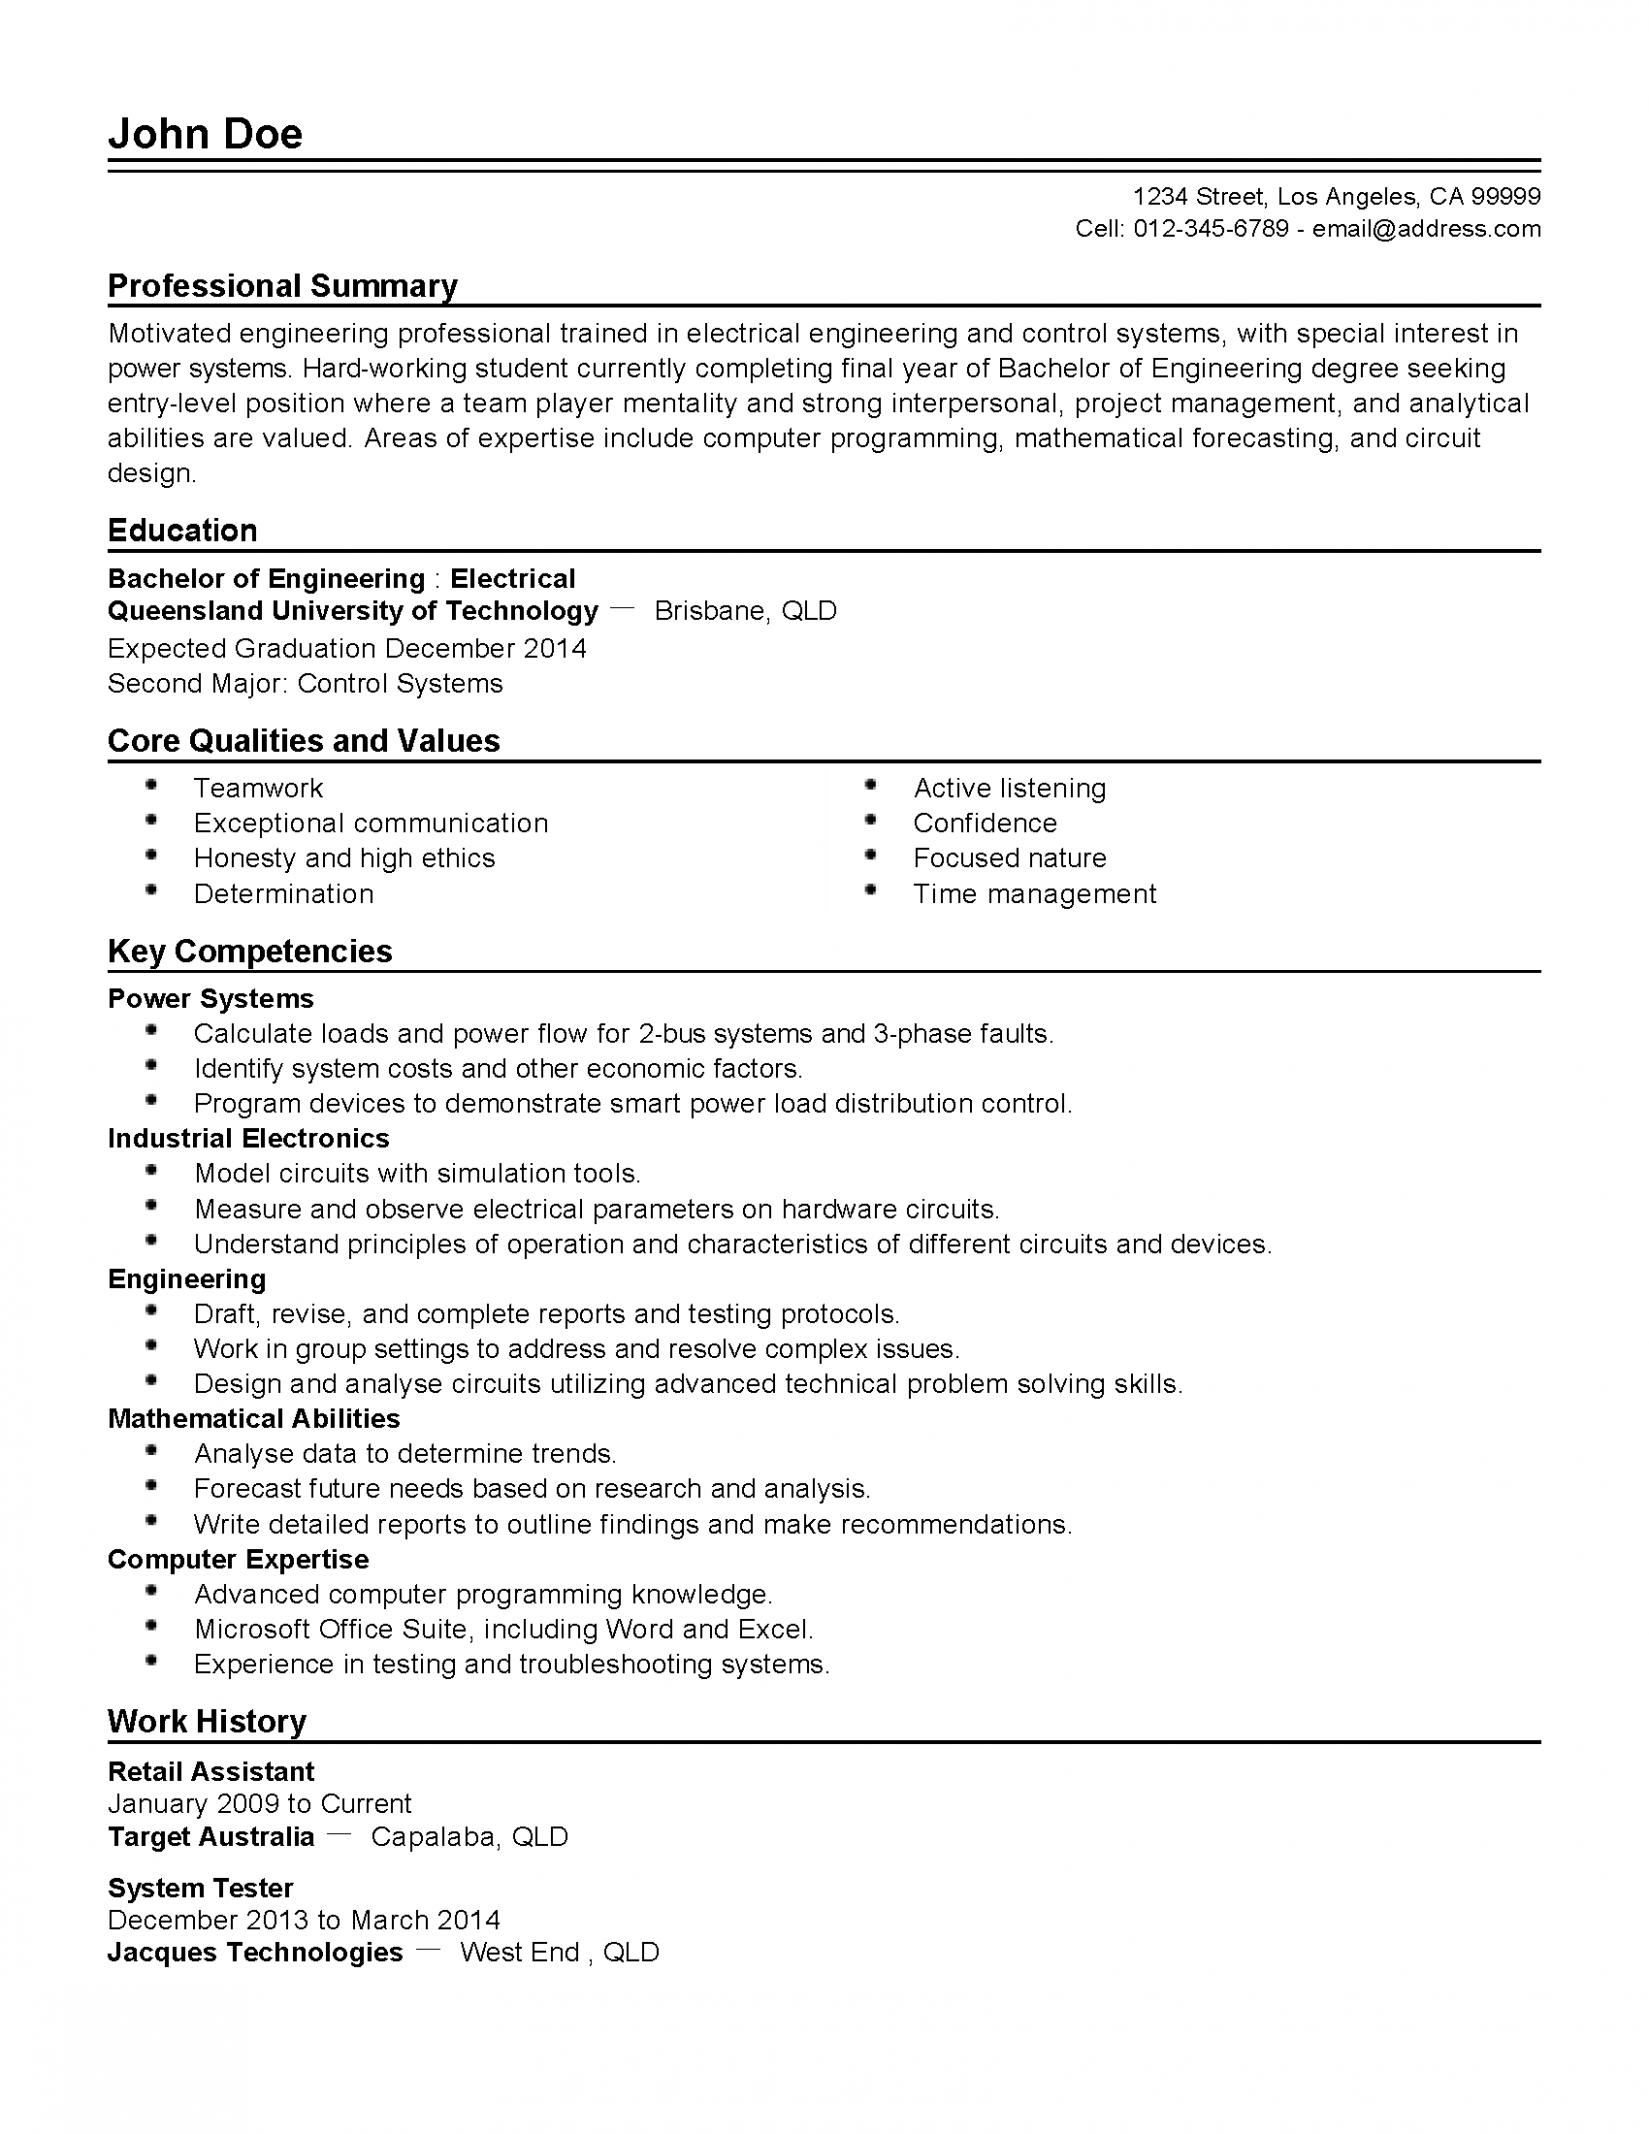 11 Pupil Resume Qld in 2020 Student resume, Job resume